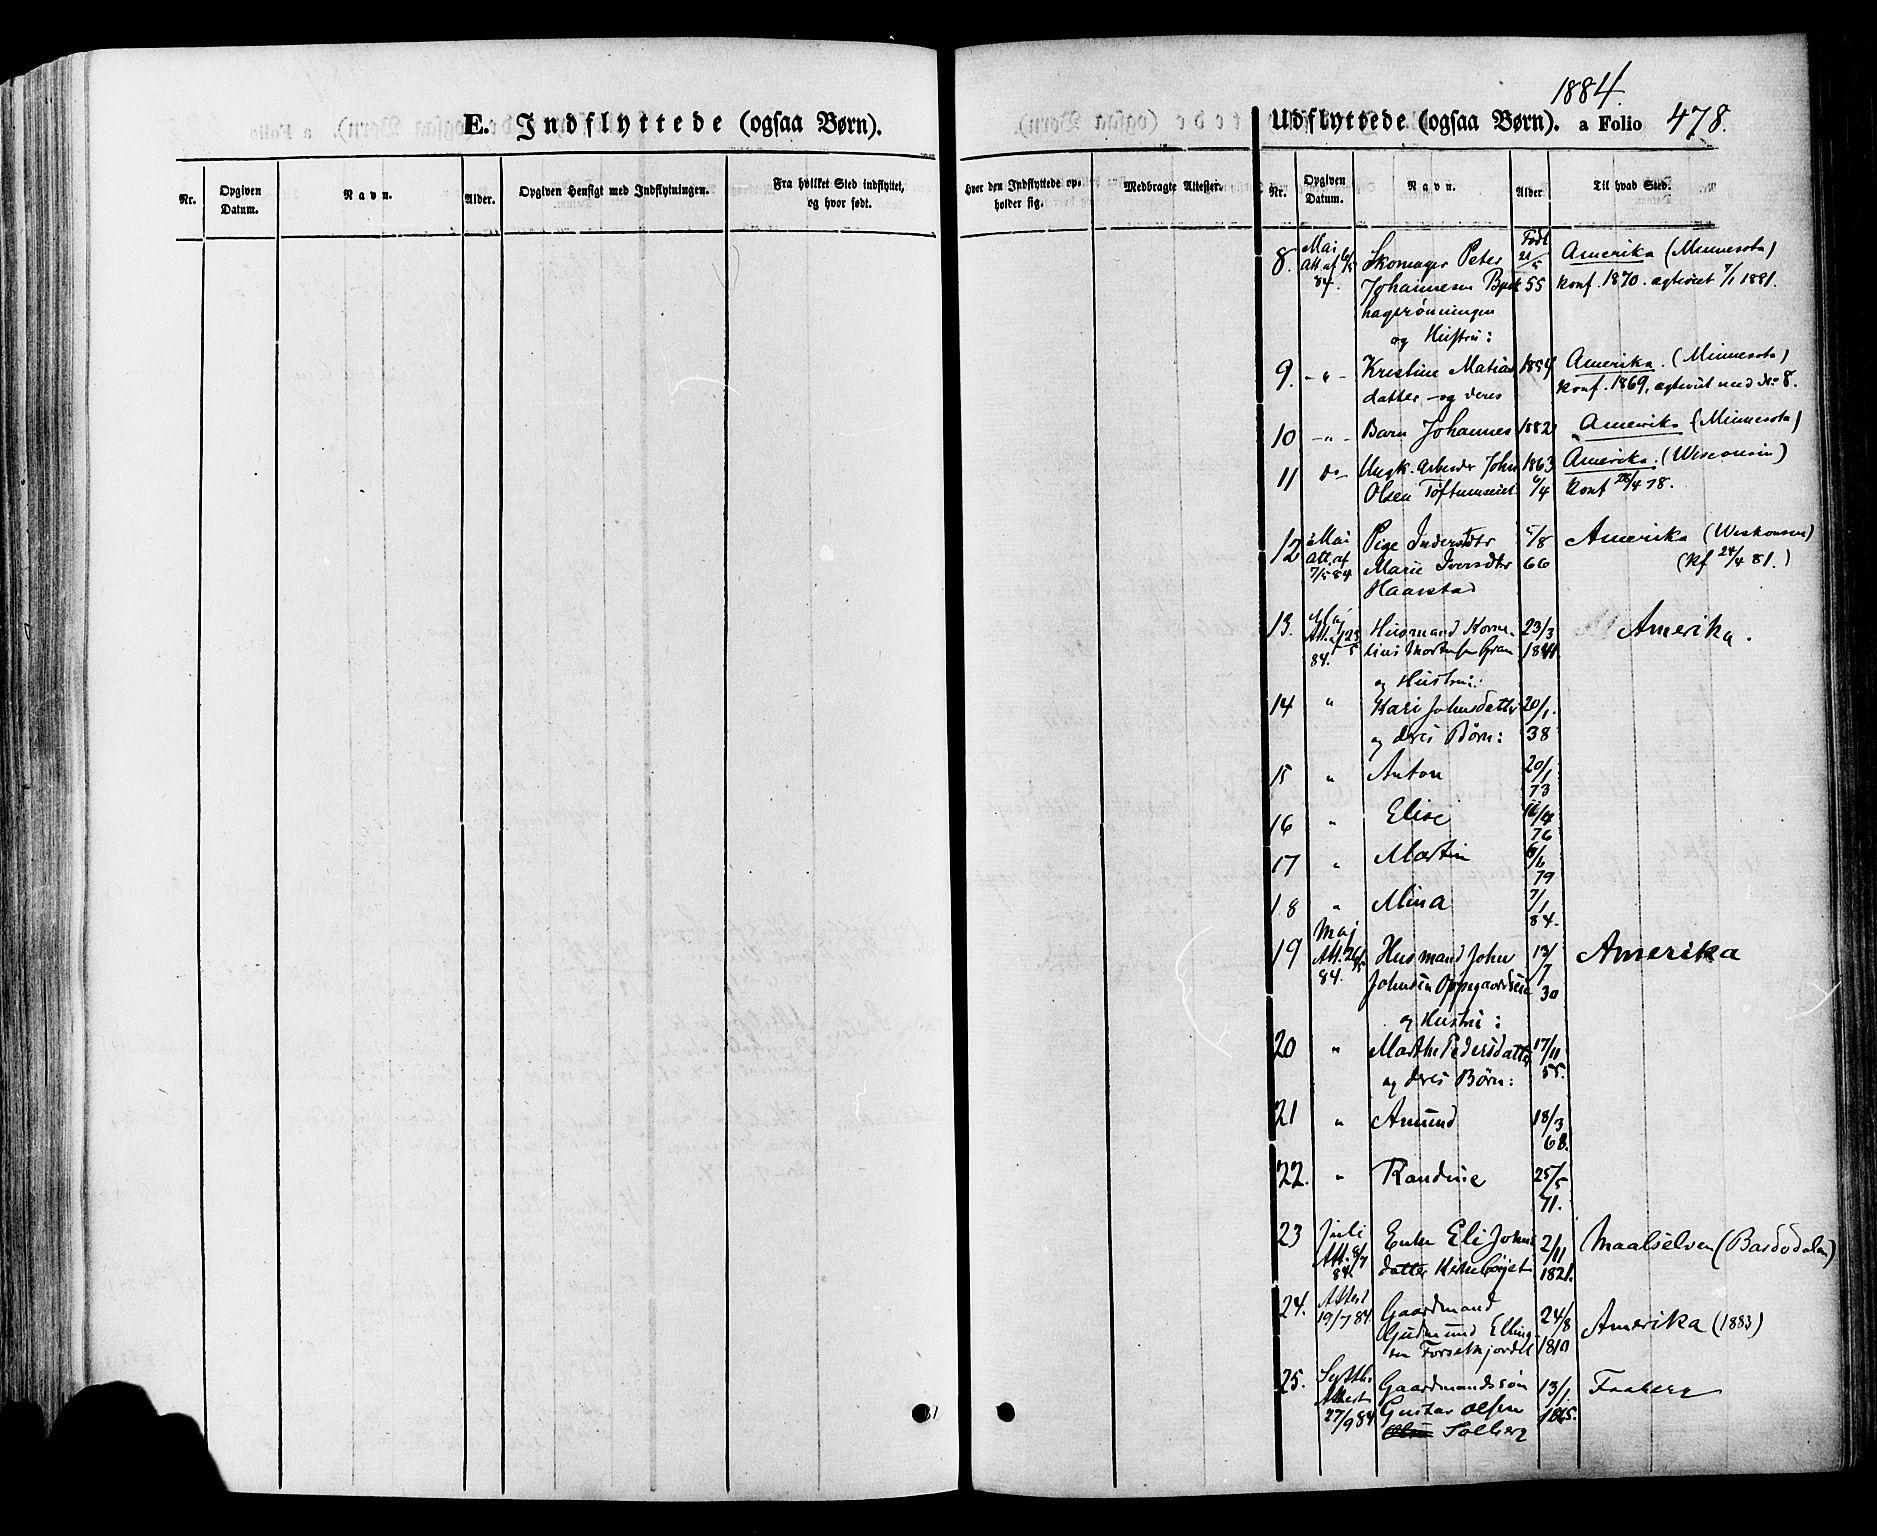 SAH, Gausdal prestekontor, Ministerialbok nr. 10, 1867-1886, s. 478